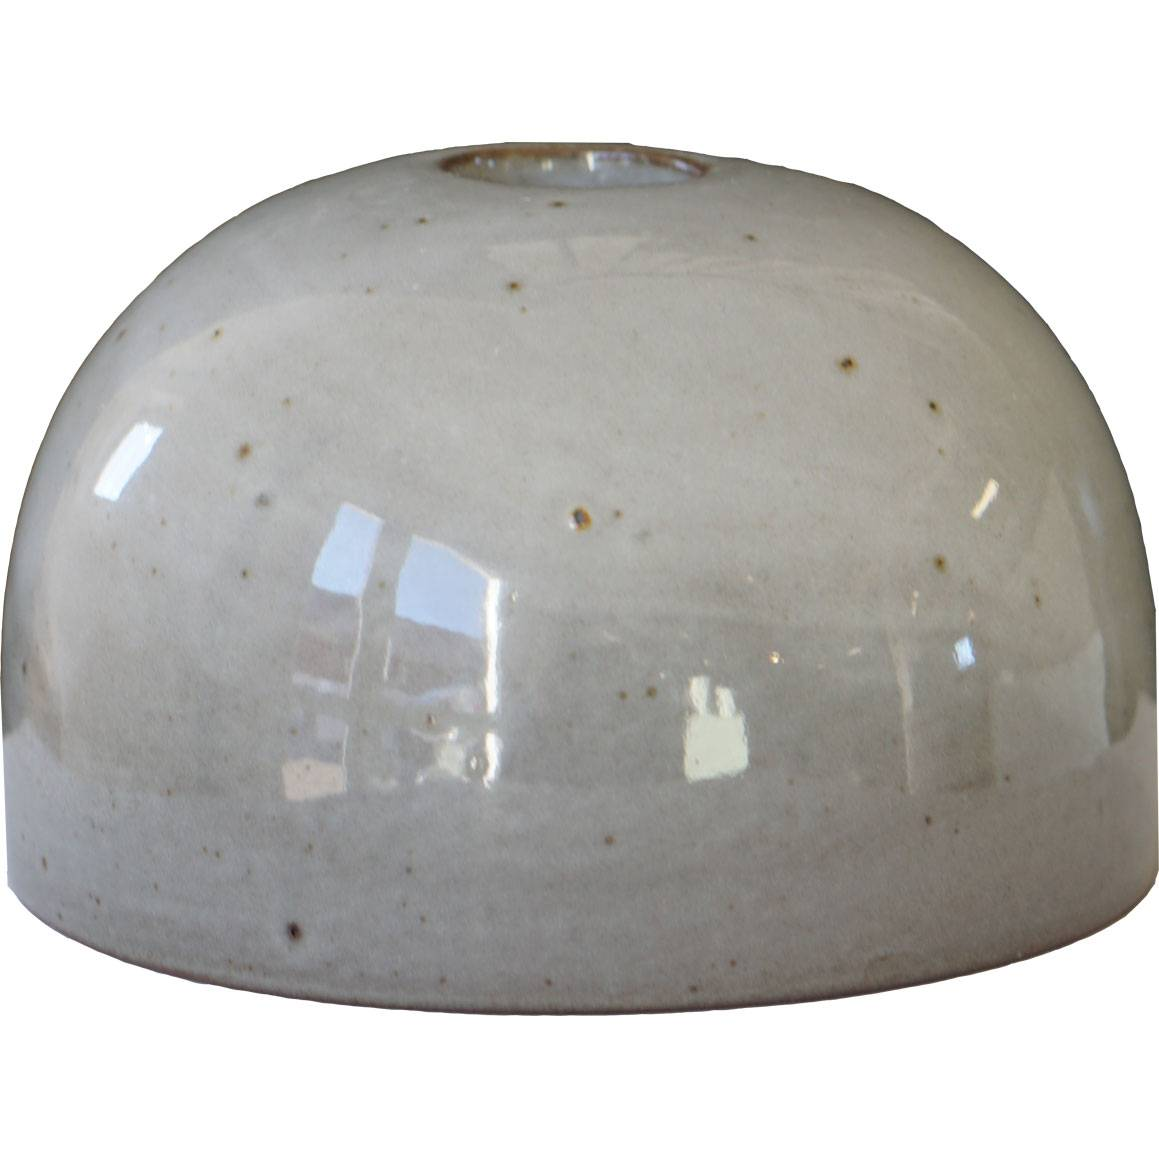 DBKD Bulb Candlestick Small, Stone